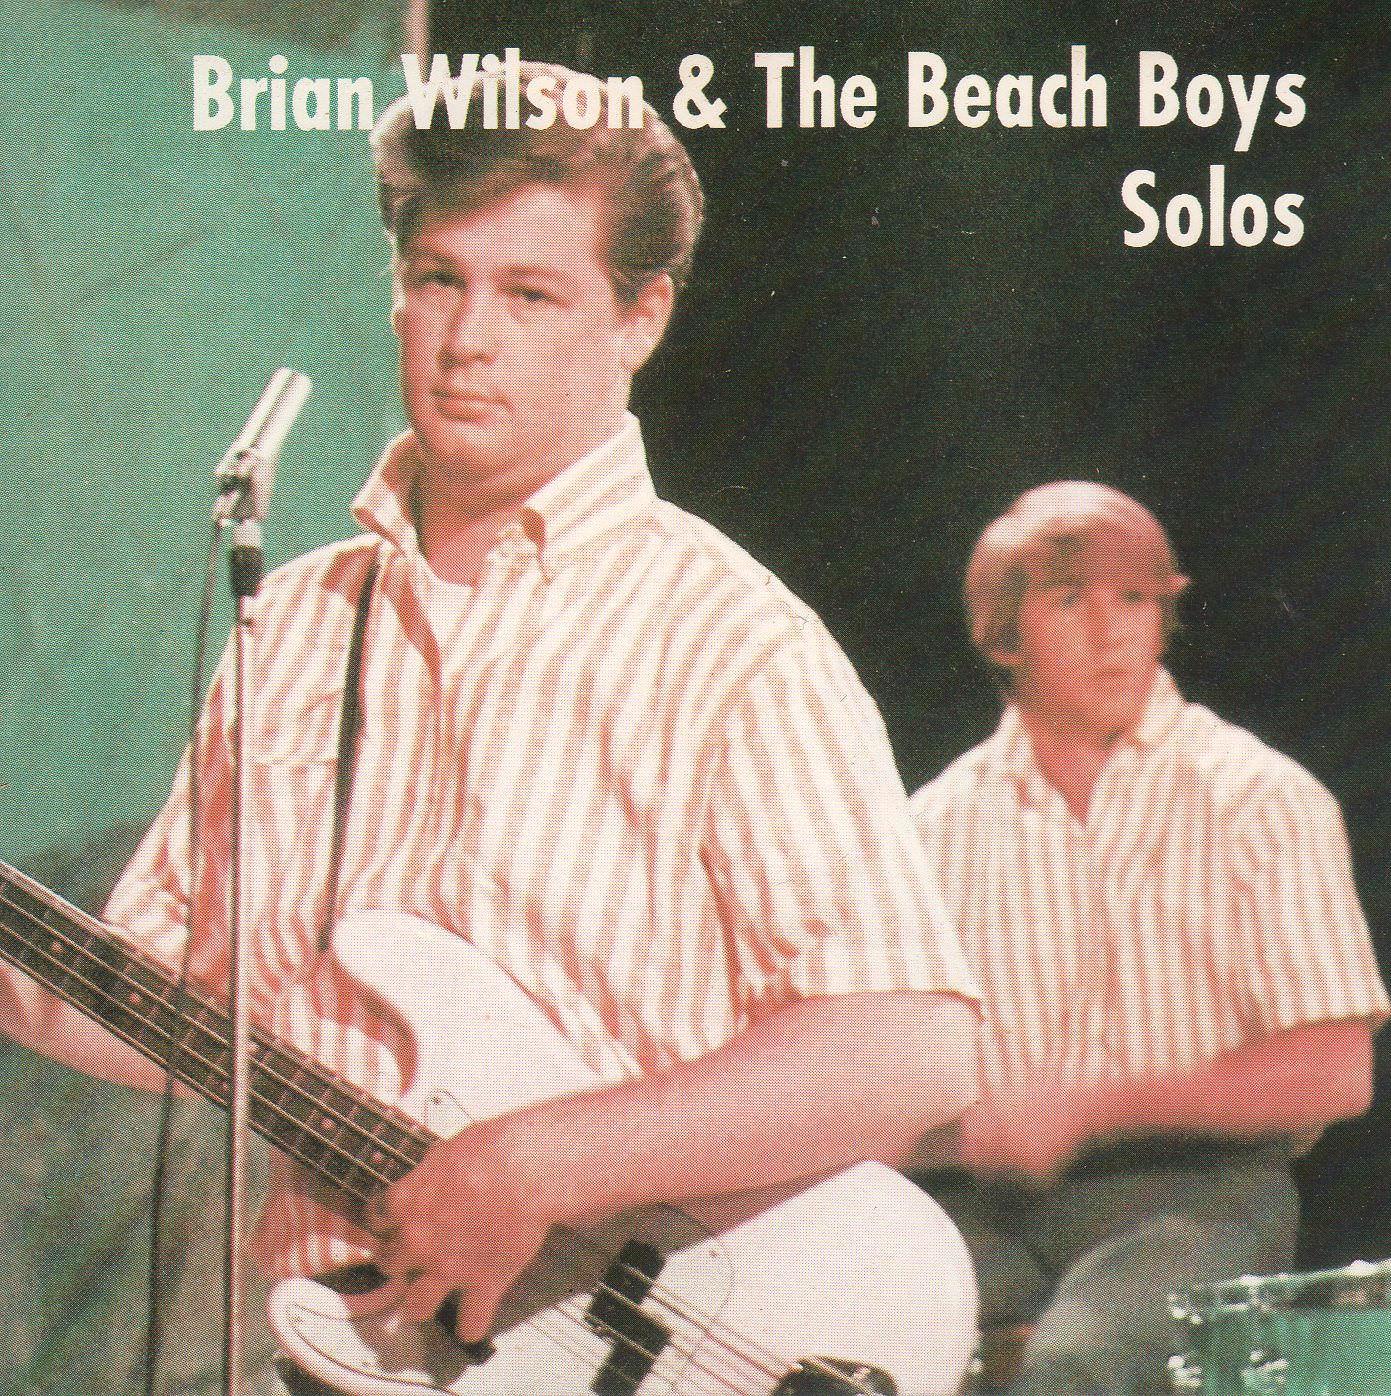 Brian Wilson & The Beach Boys Solos cover